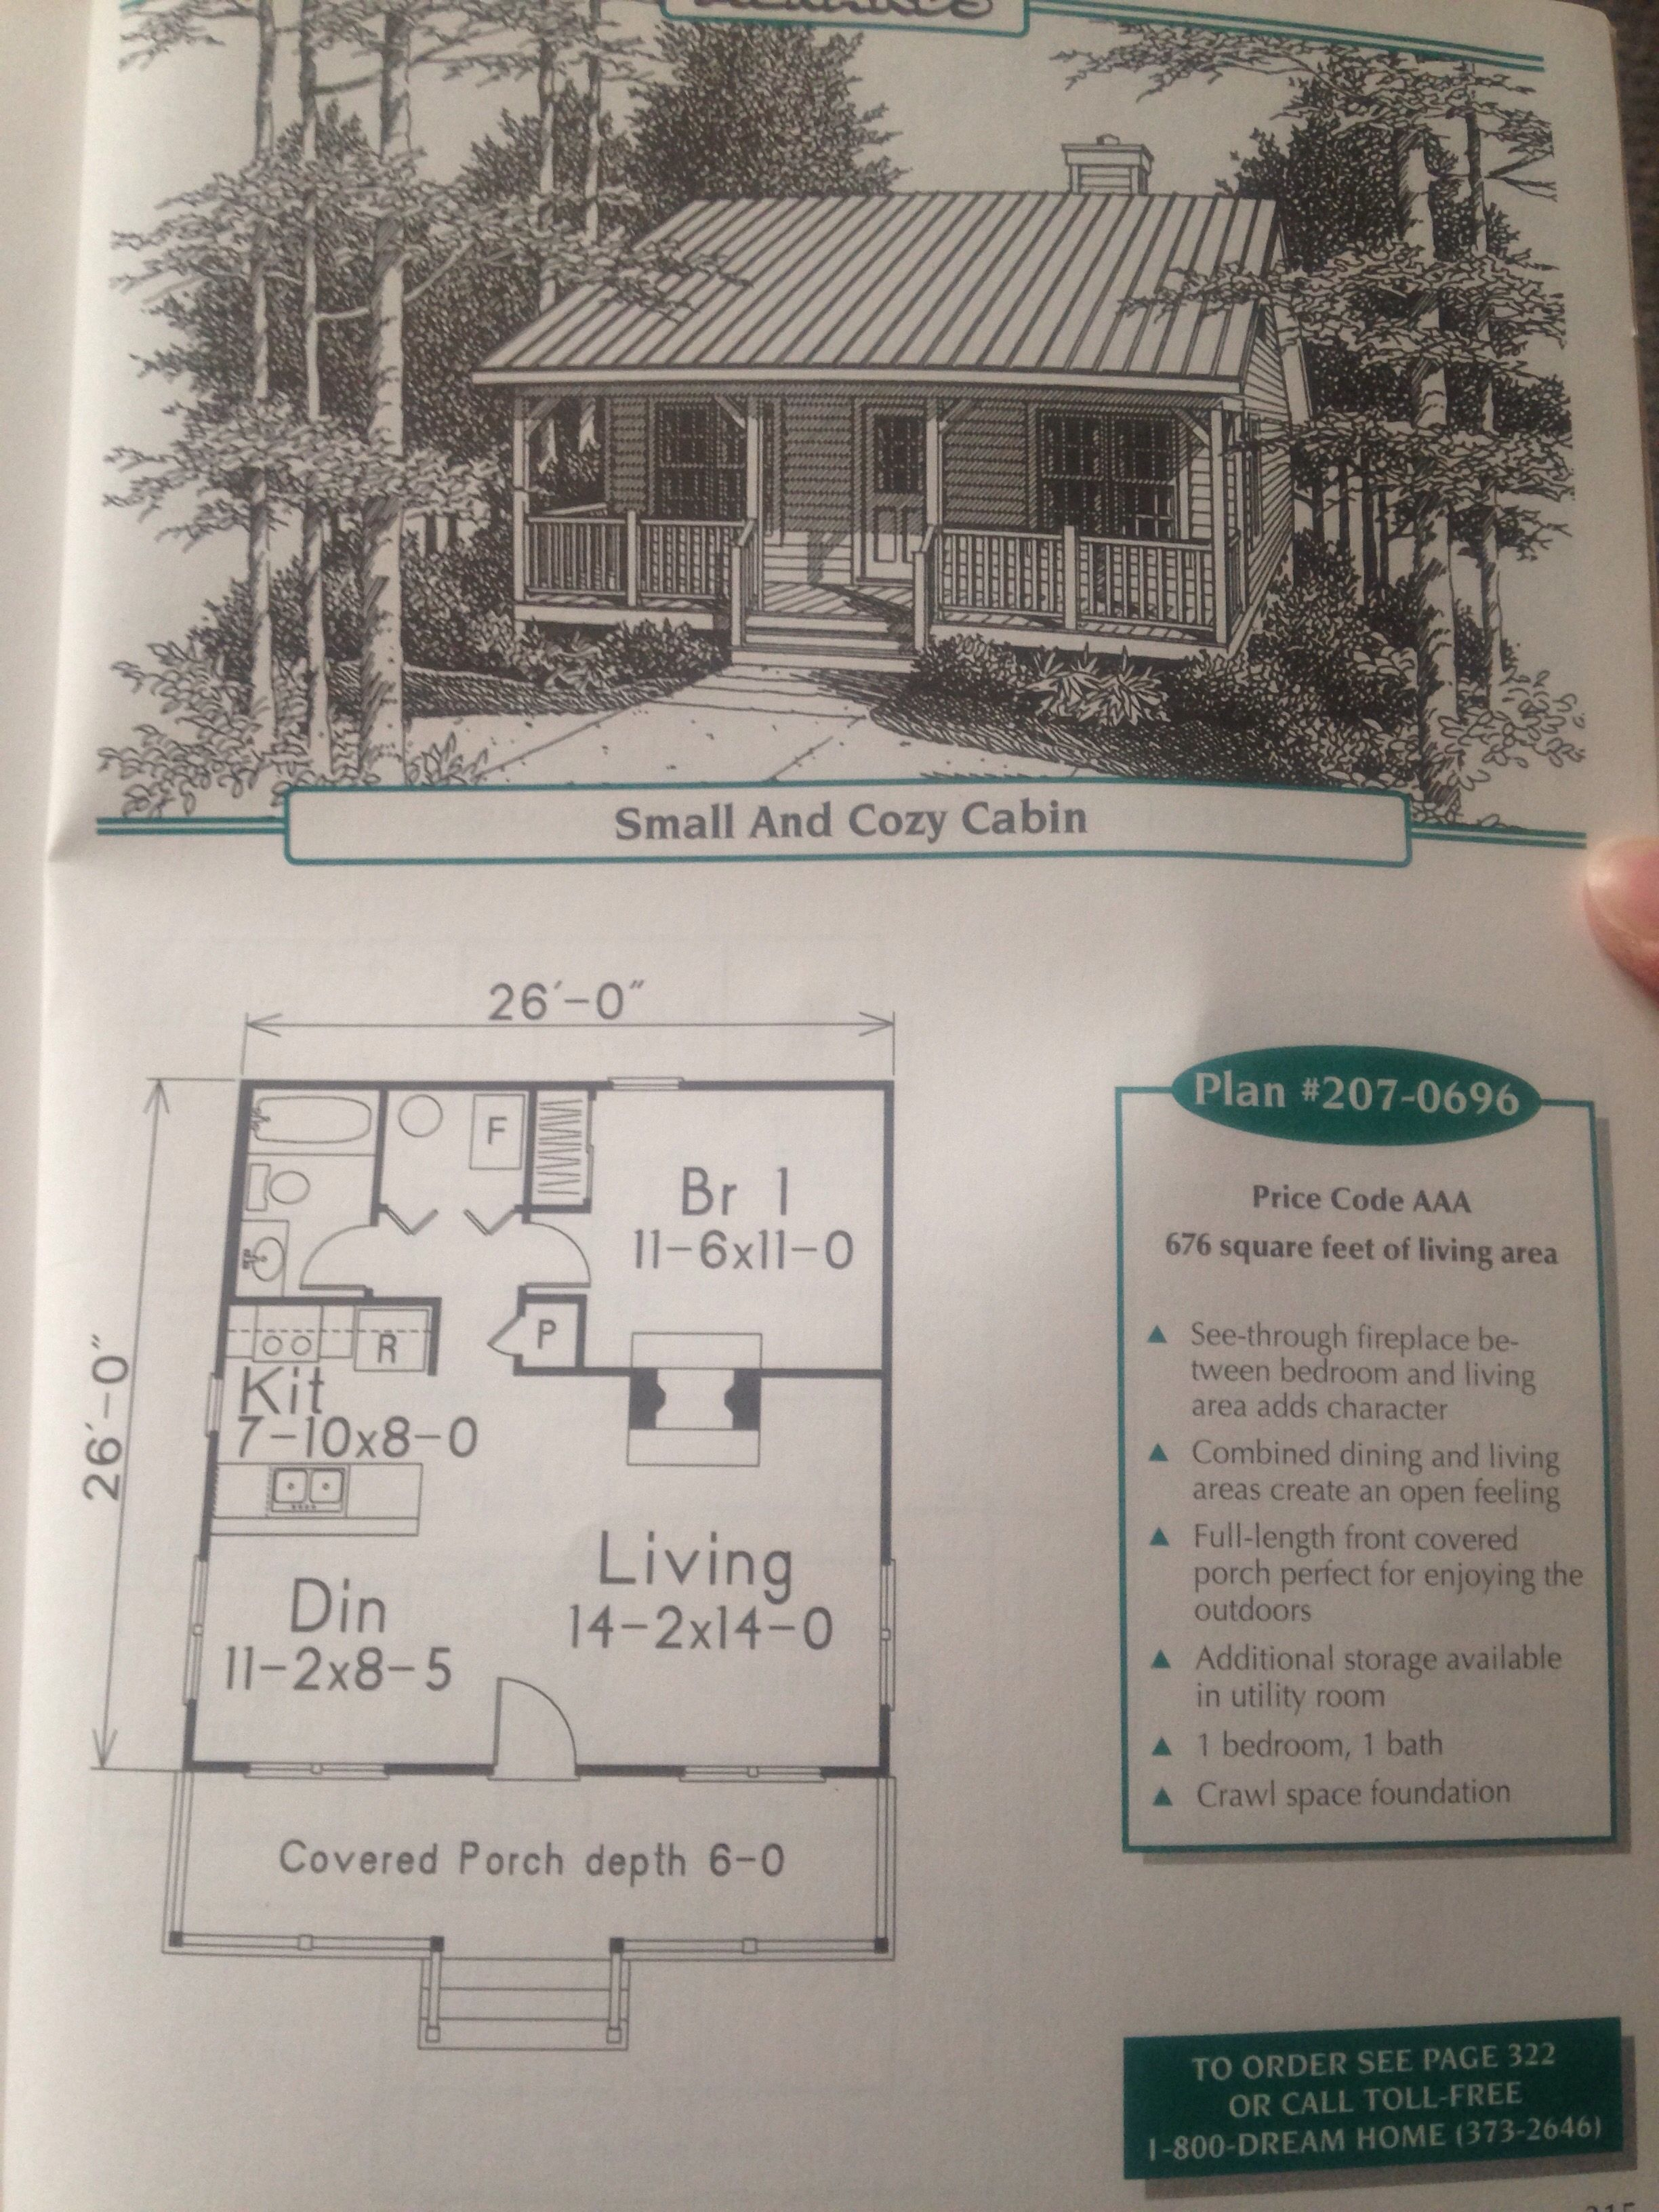 pg 315 menards home plans encyclopedia cozy cabin how